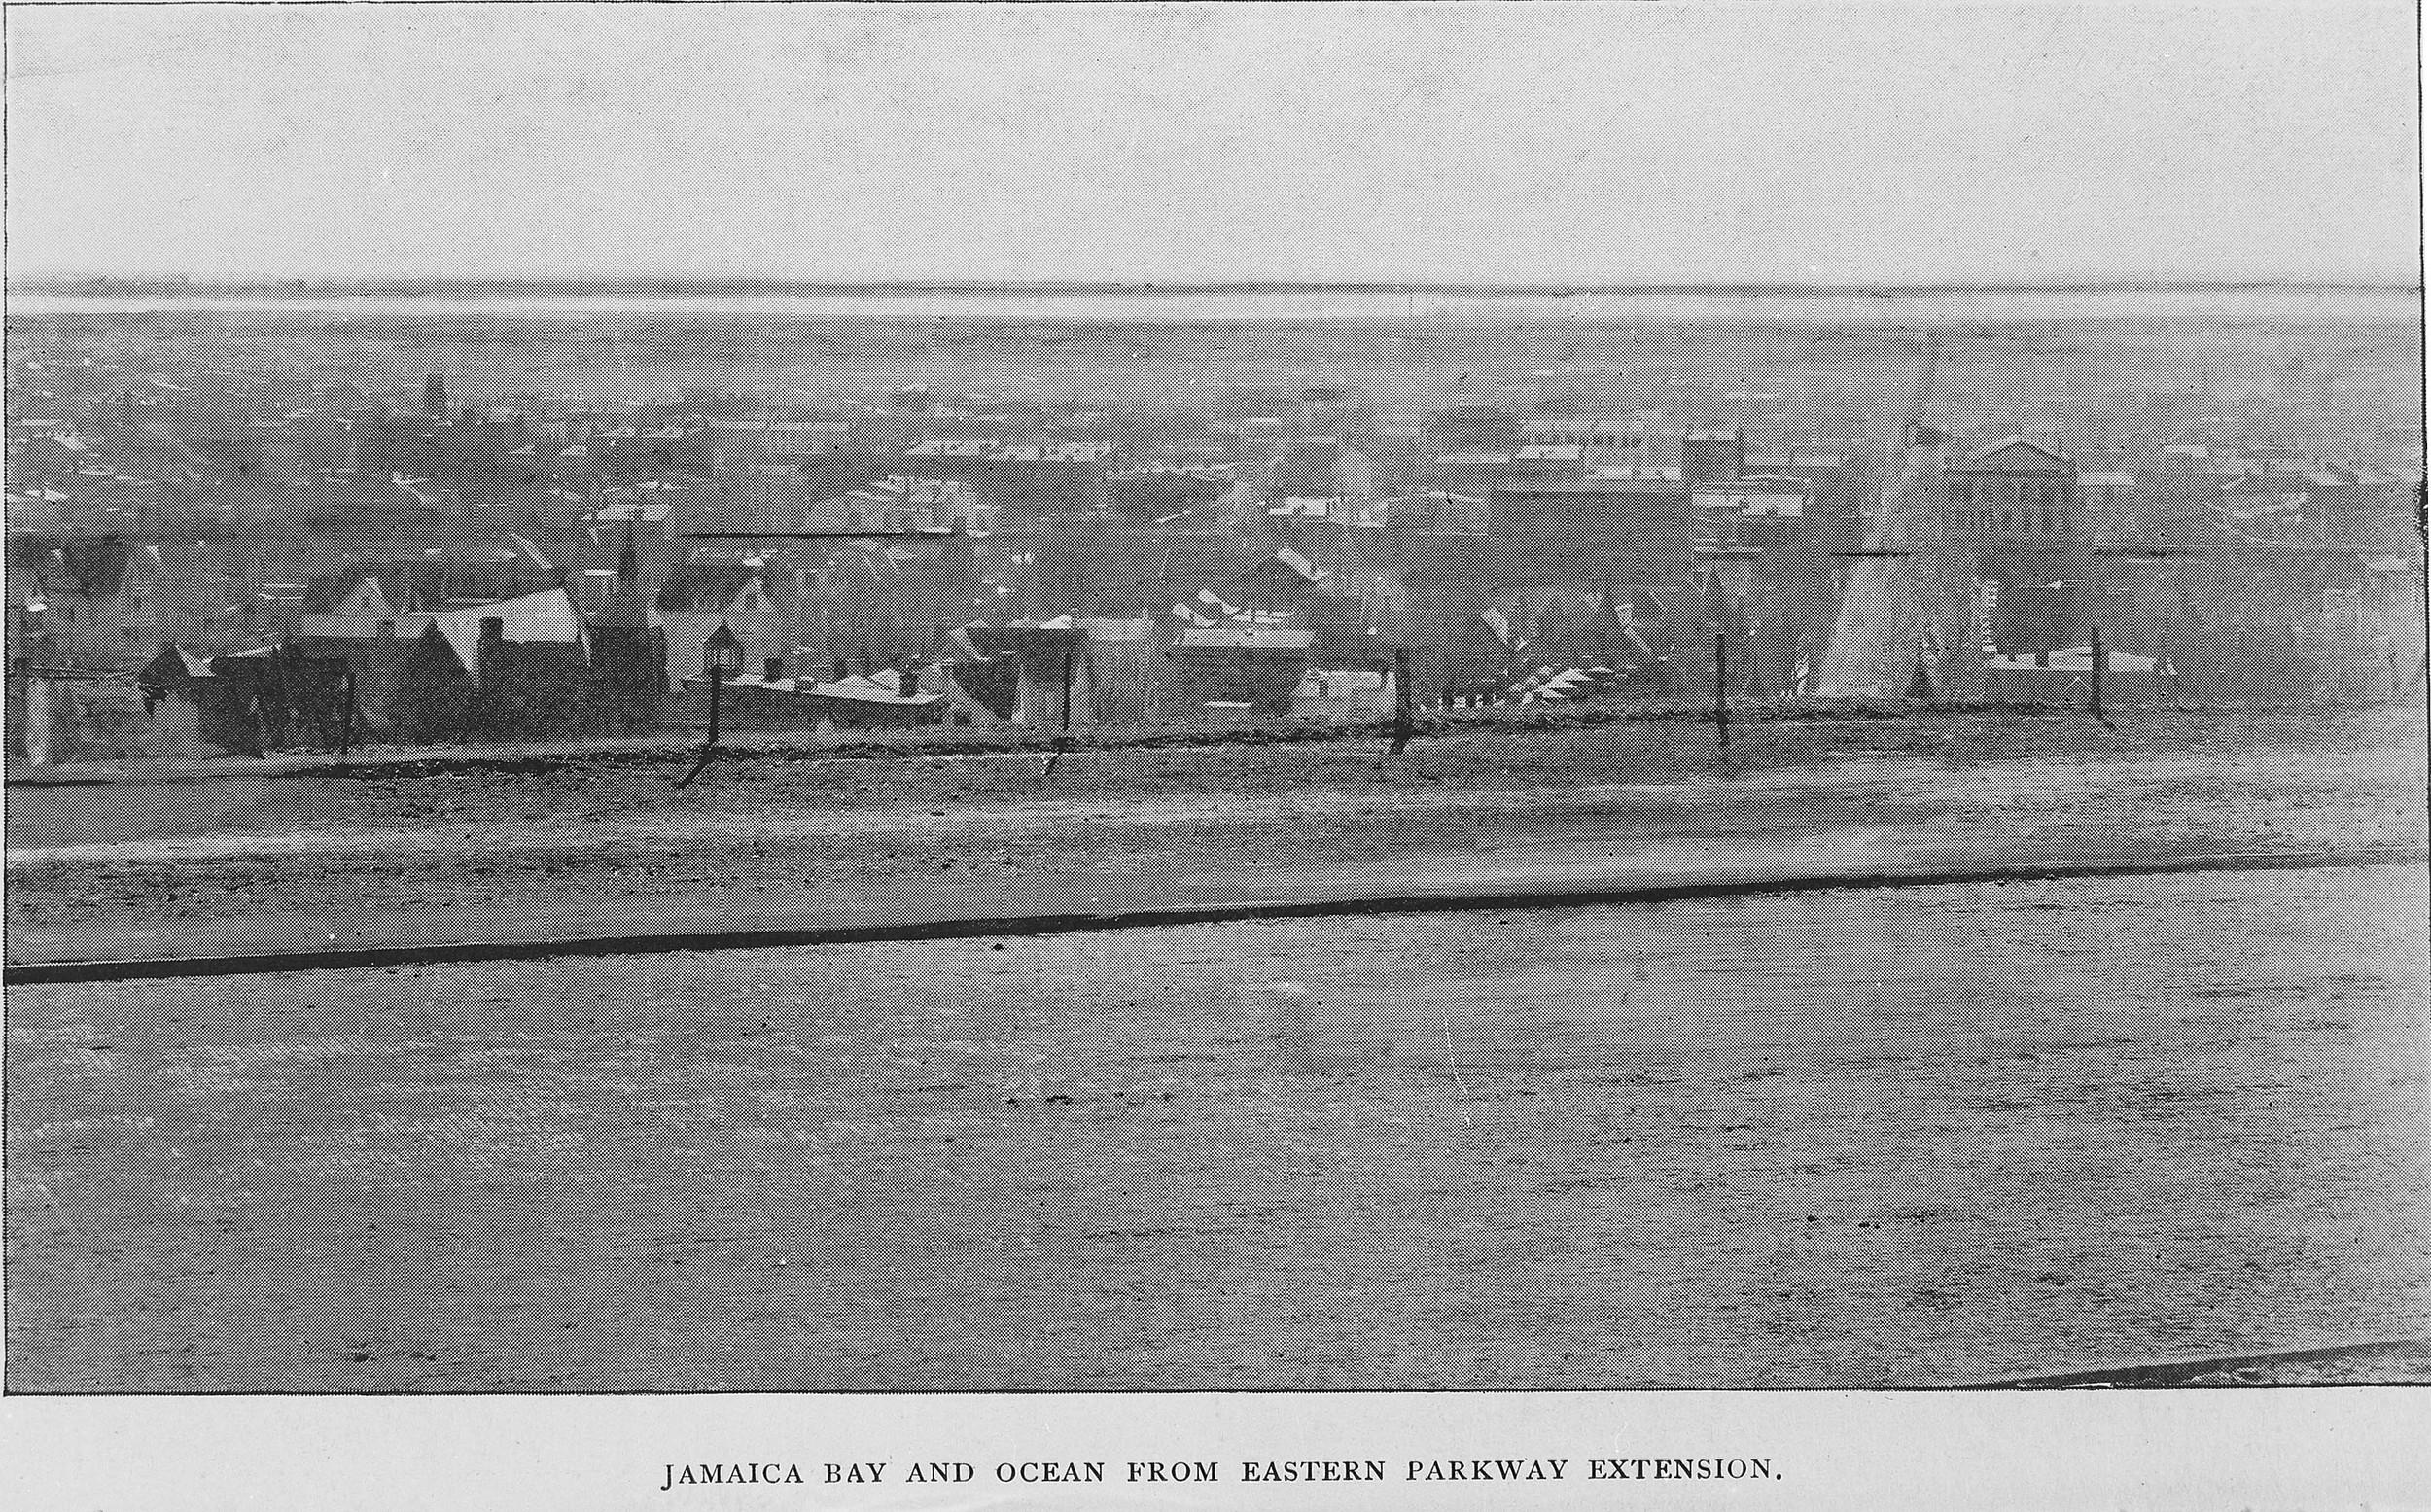 Jamaica Bay (1896)